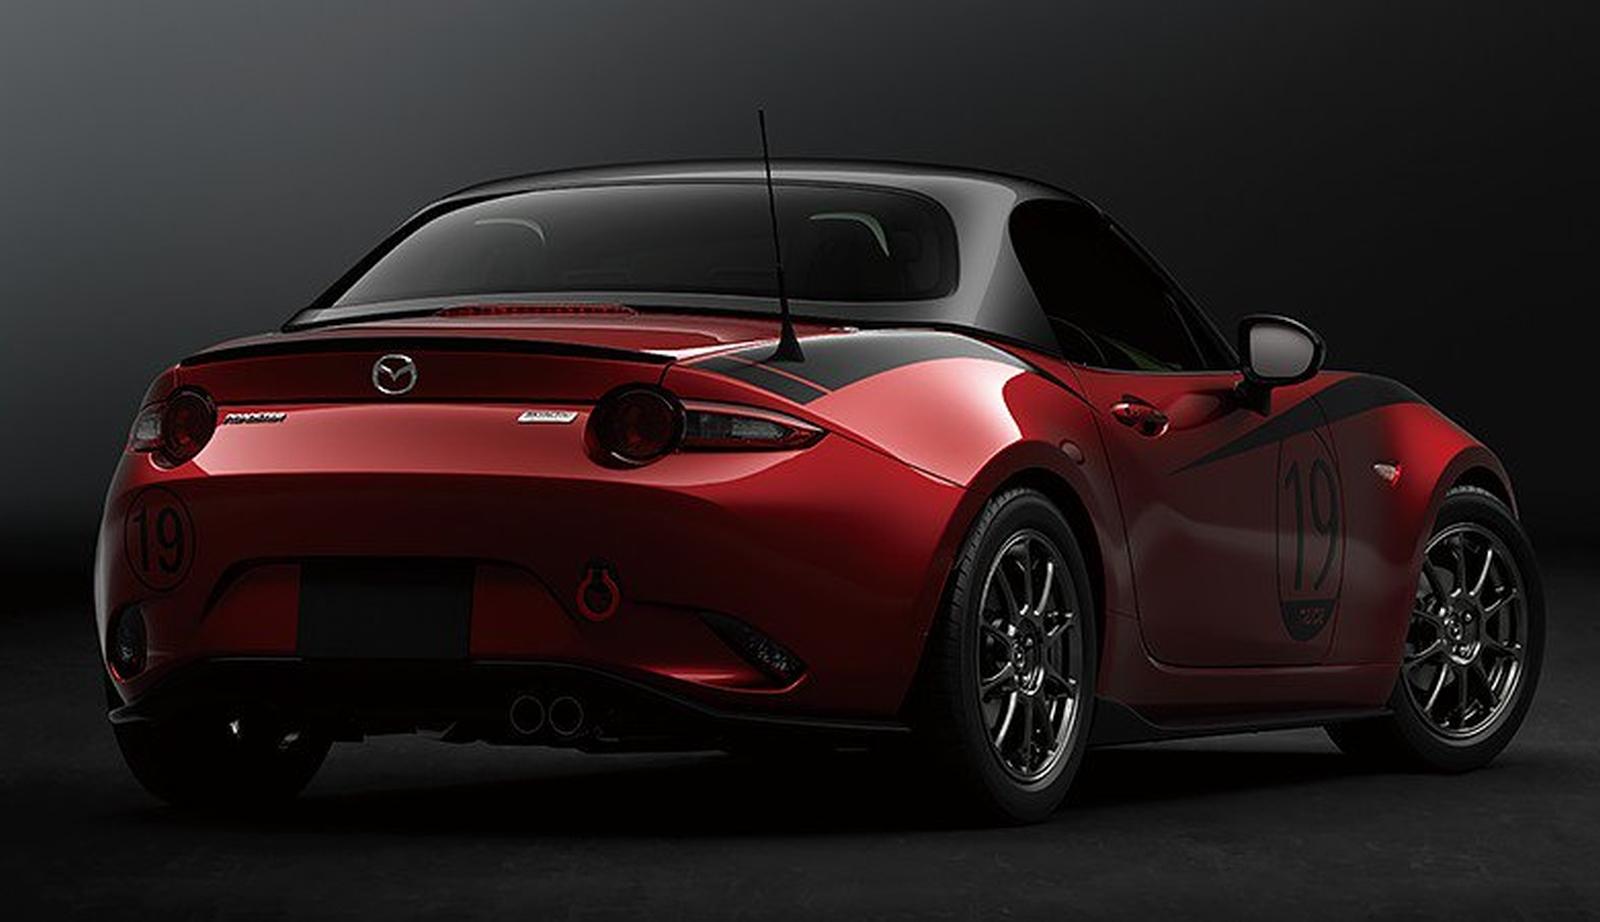 Mazda MX-5 Roadster Drop-Head Coupé Concept 2019